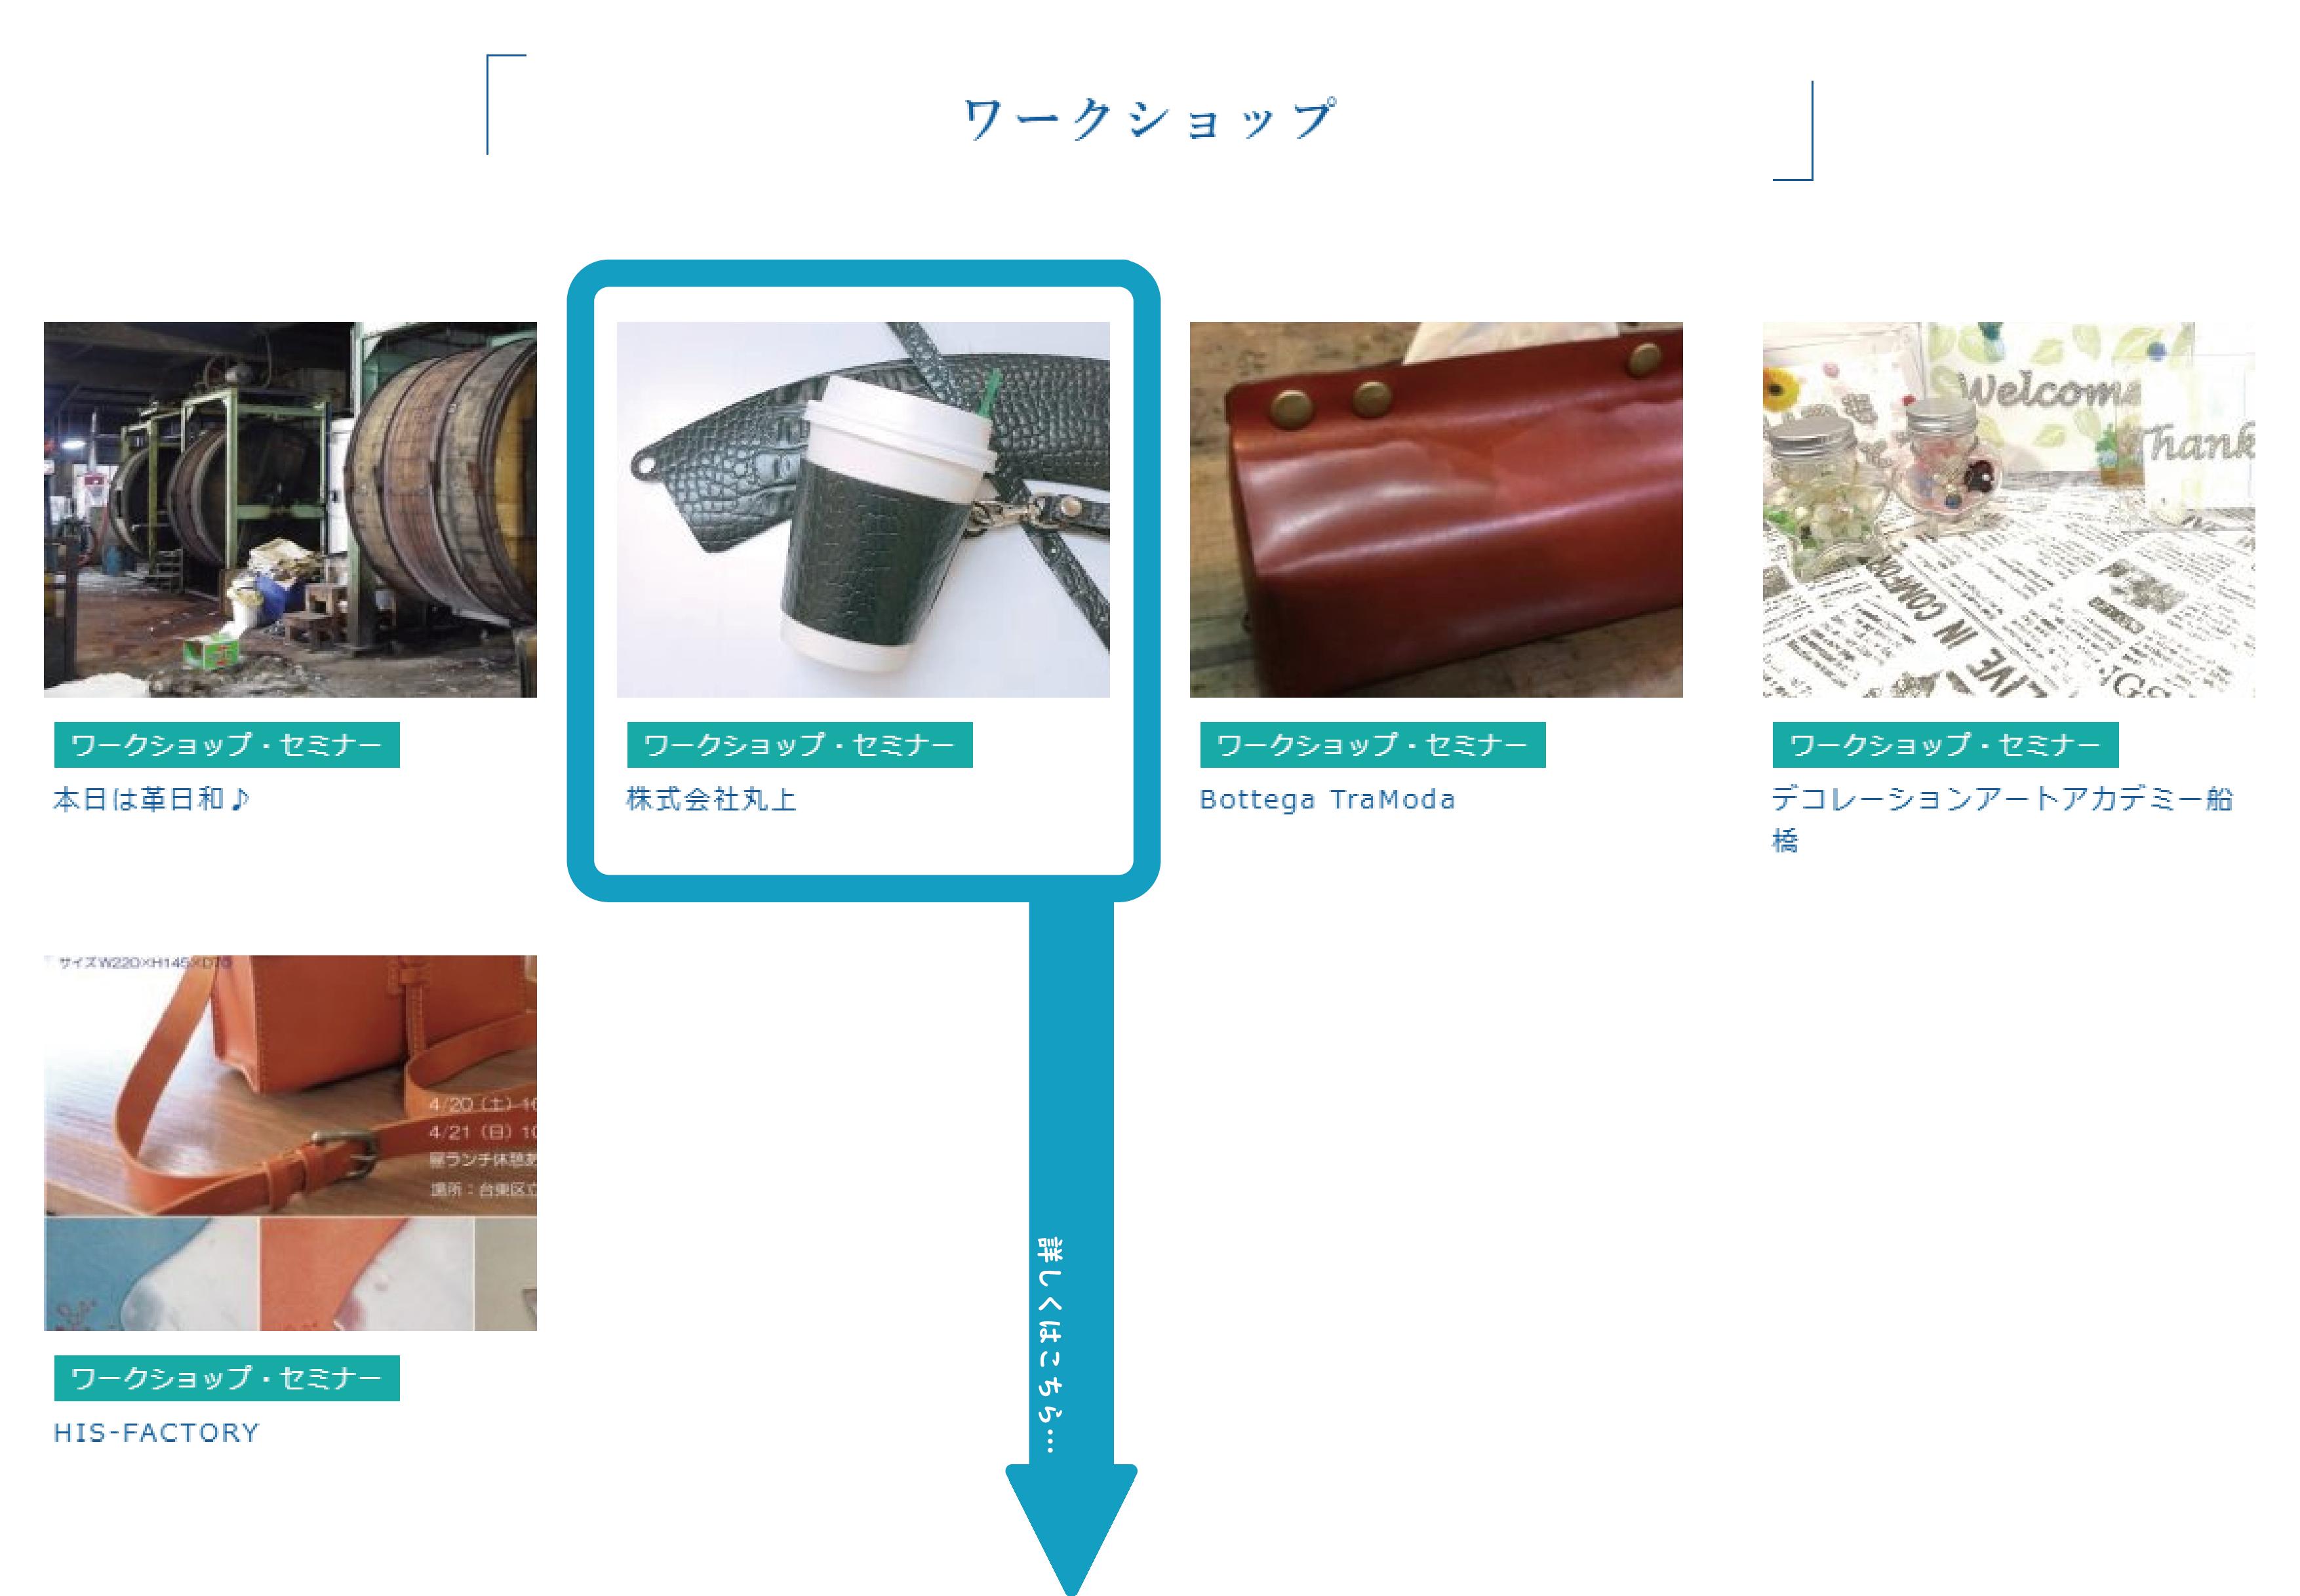 A-ROUND 2019 SPRING エーラウンド ワークショップ カップホルダー 出店情報 株式会社丸上